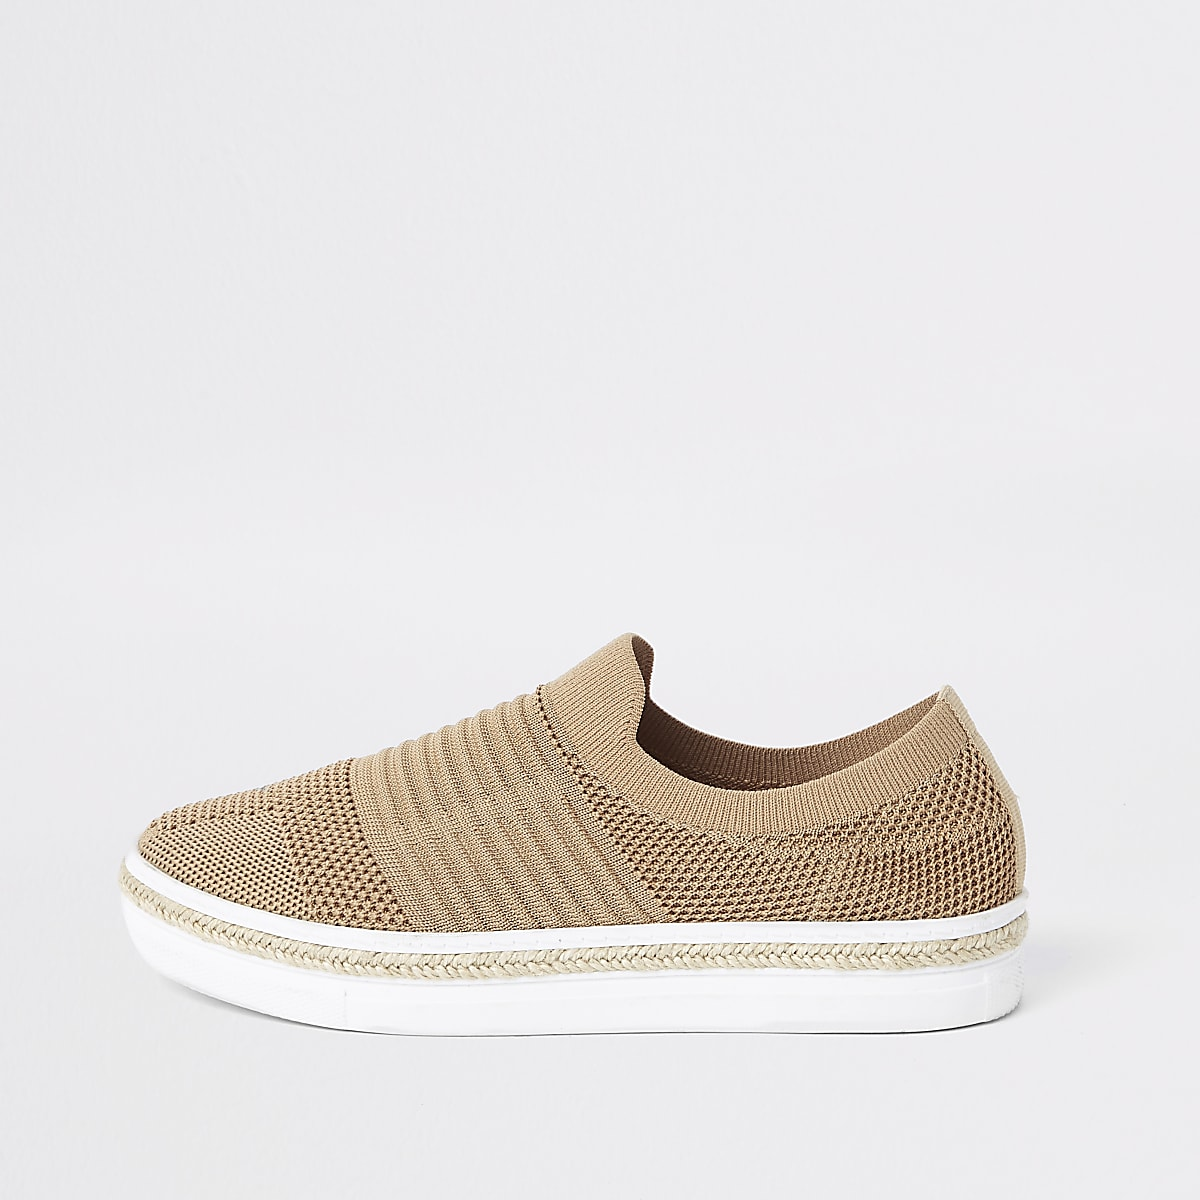 Beige knitted runner espadrille sneakers